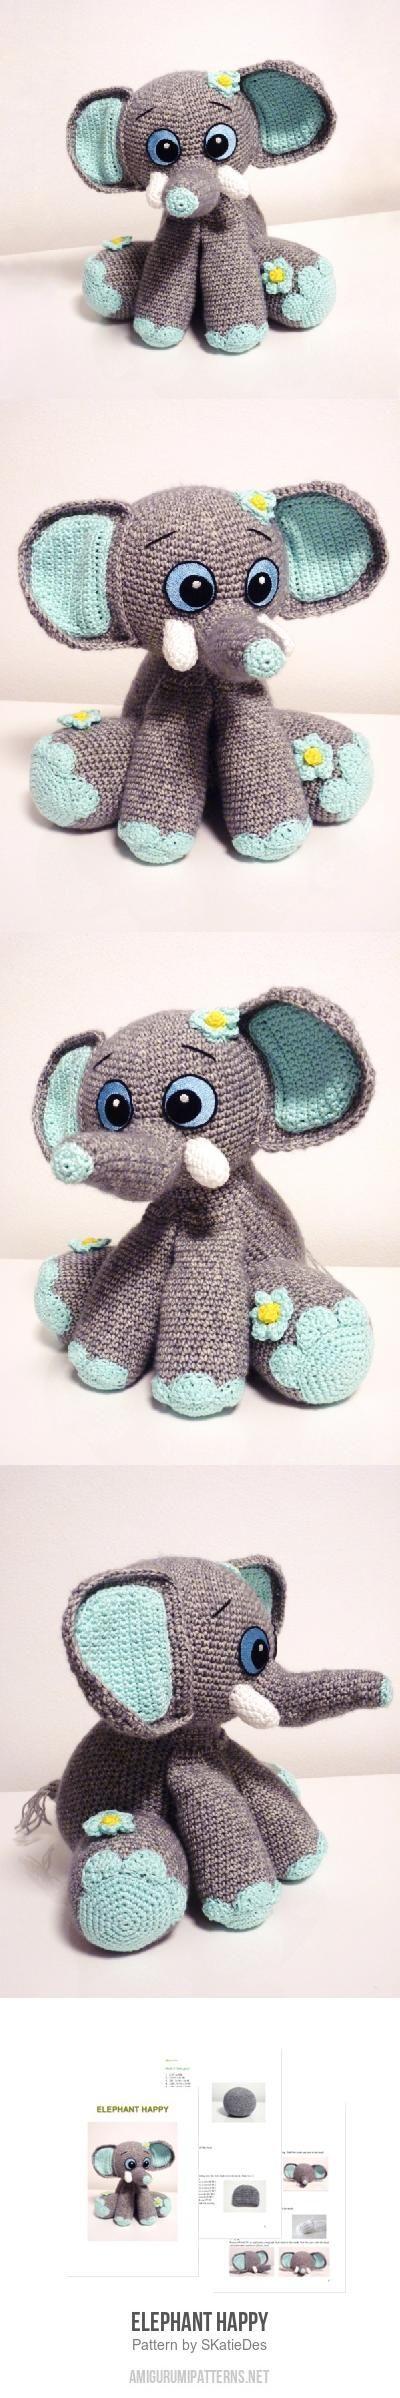 Elephant Happy amigurumi pattern